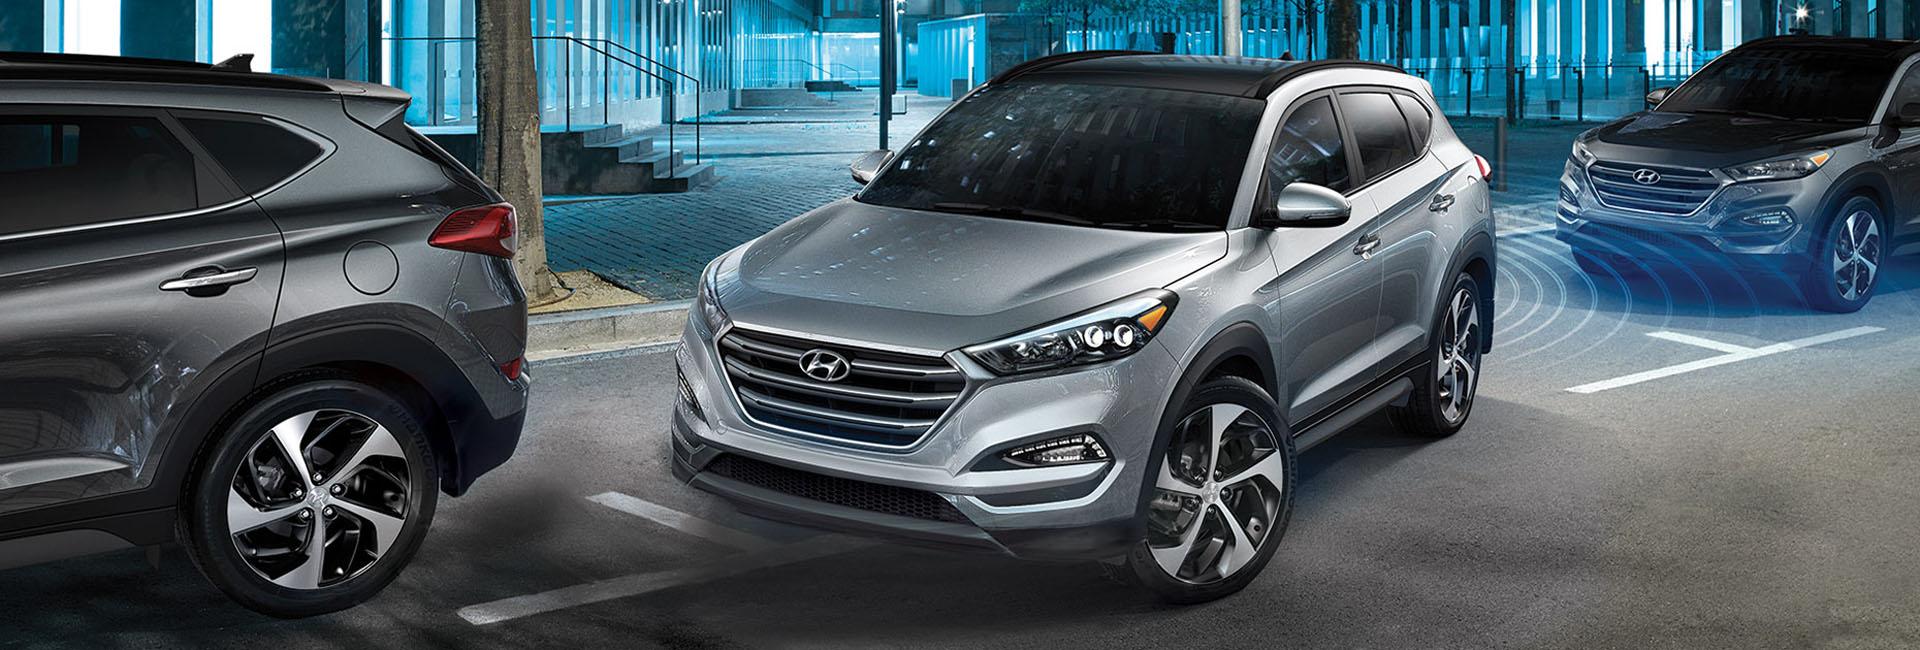 2017-Hyundai-Tucson-Model-Header-Pathway-Hyundai